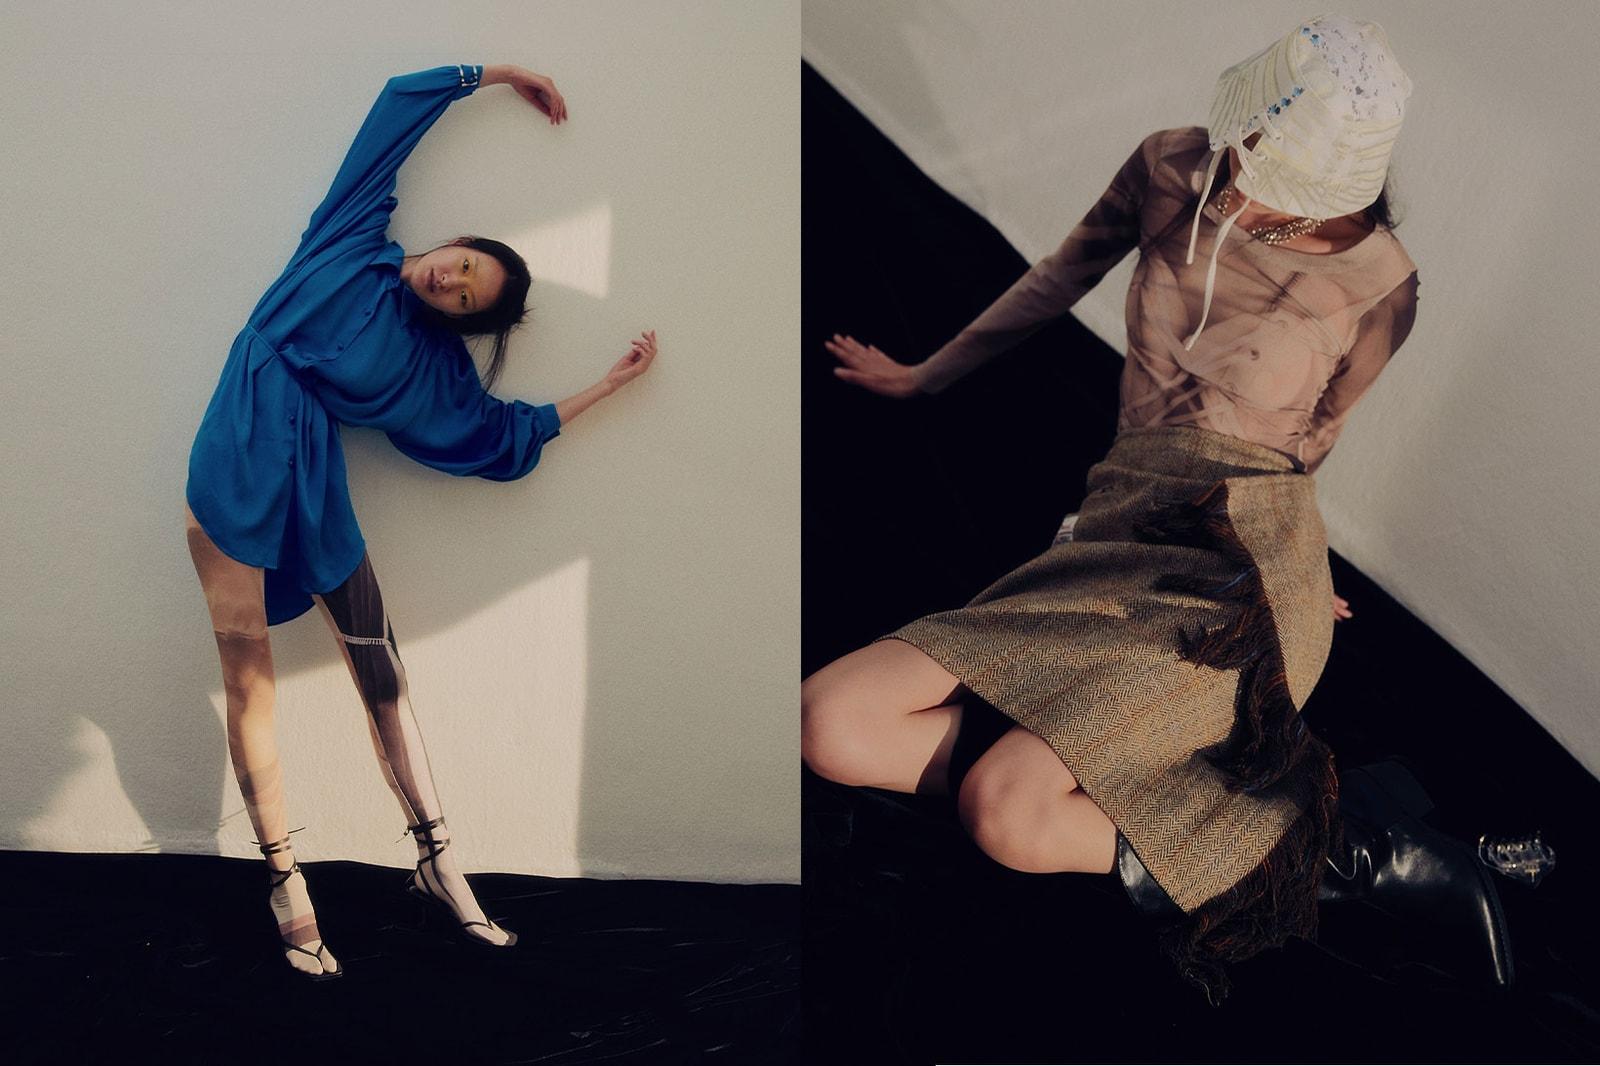 korean fashion emerging female fashion designers brands 2000archives two thousand blue dress sheer top